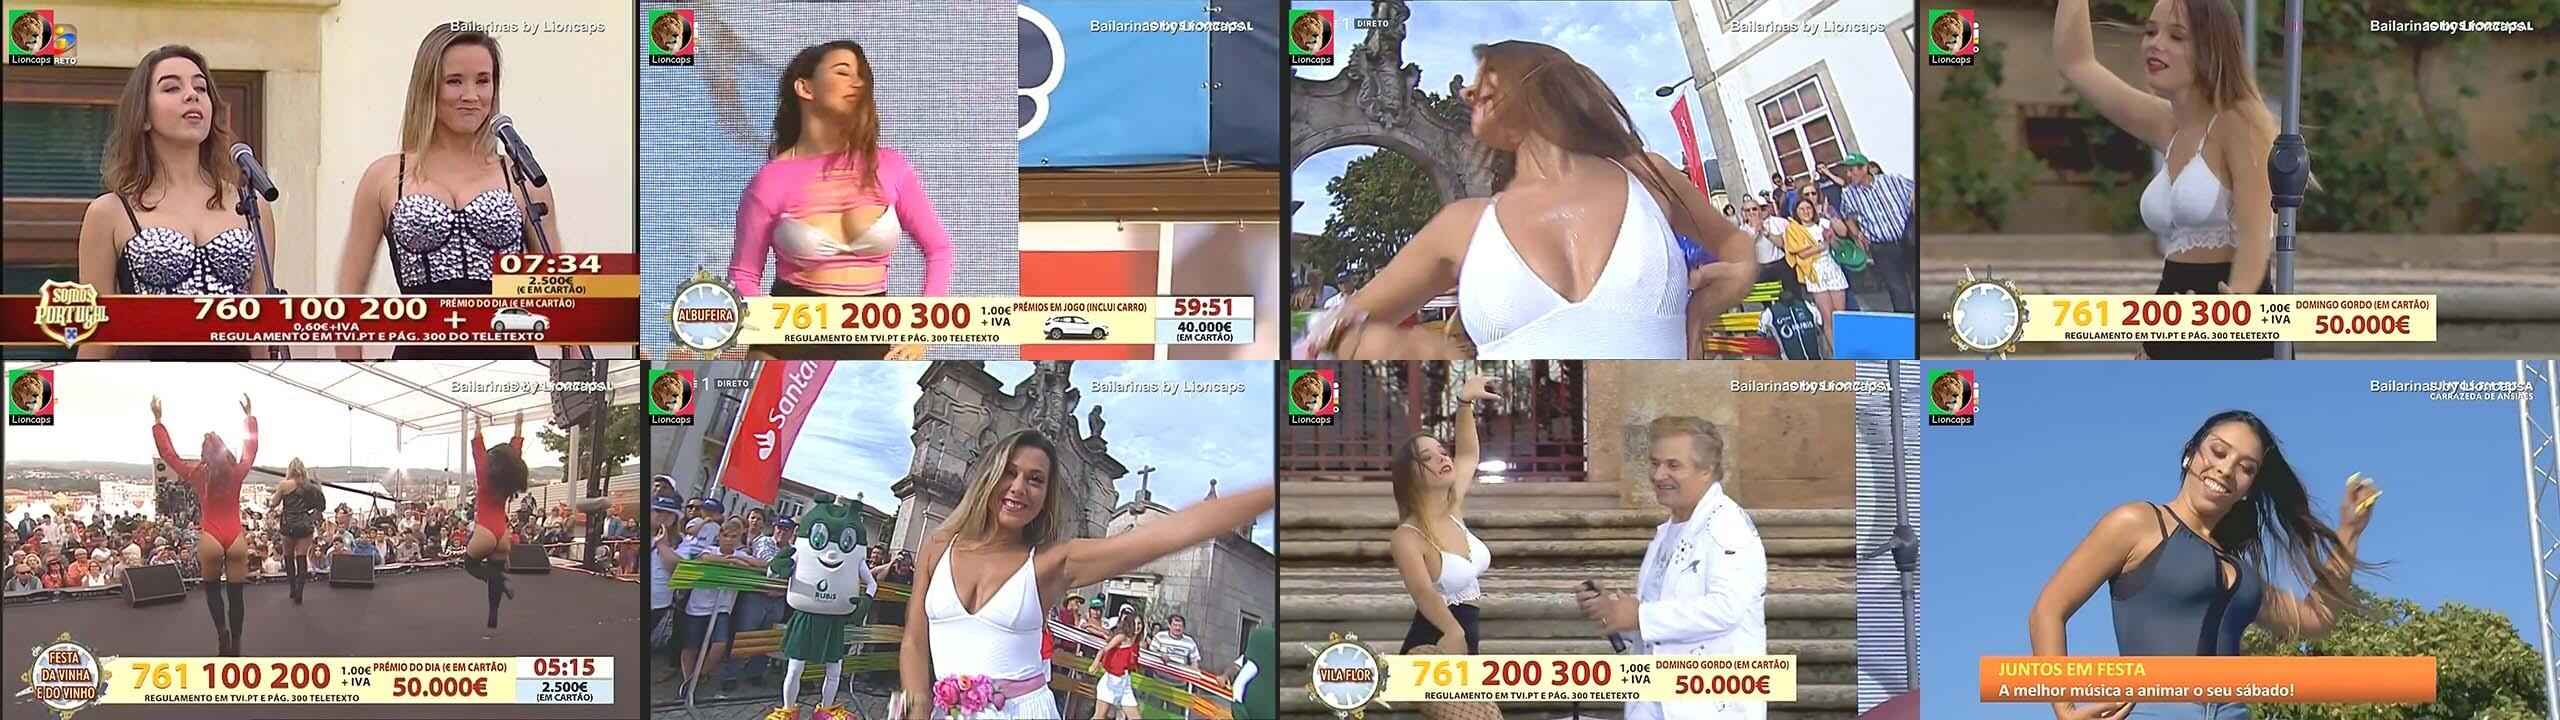 bailarinas_lioncaps_10_08_2020_06.jpg